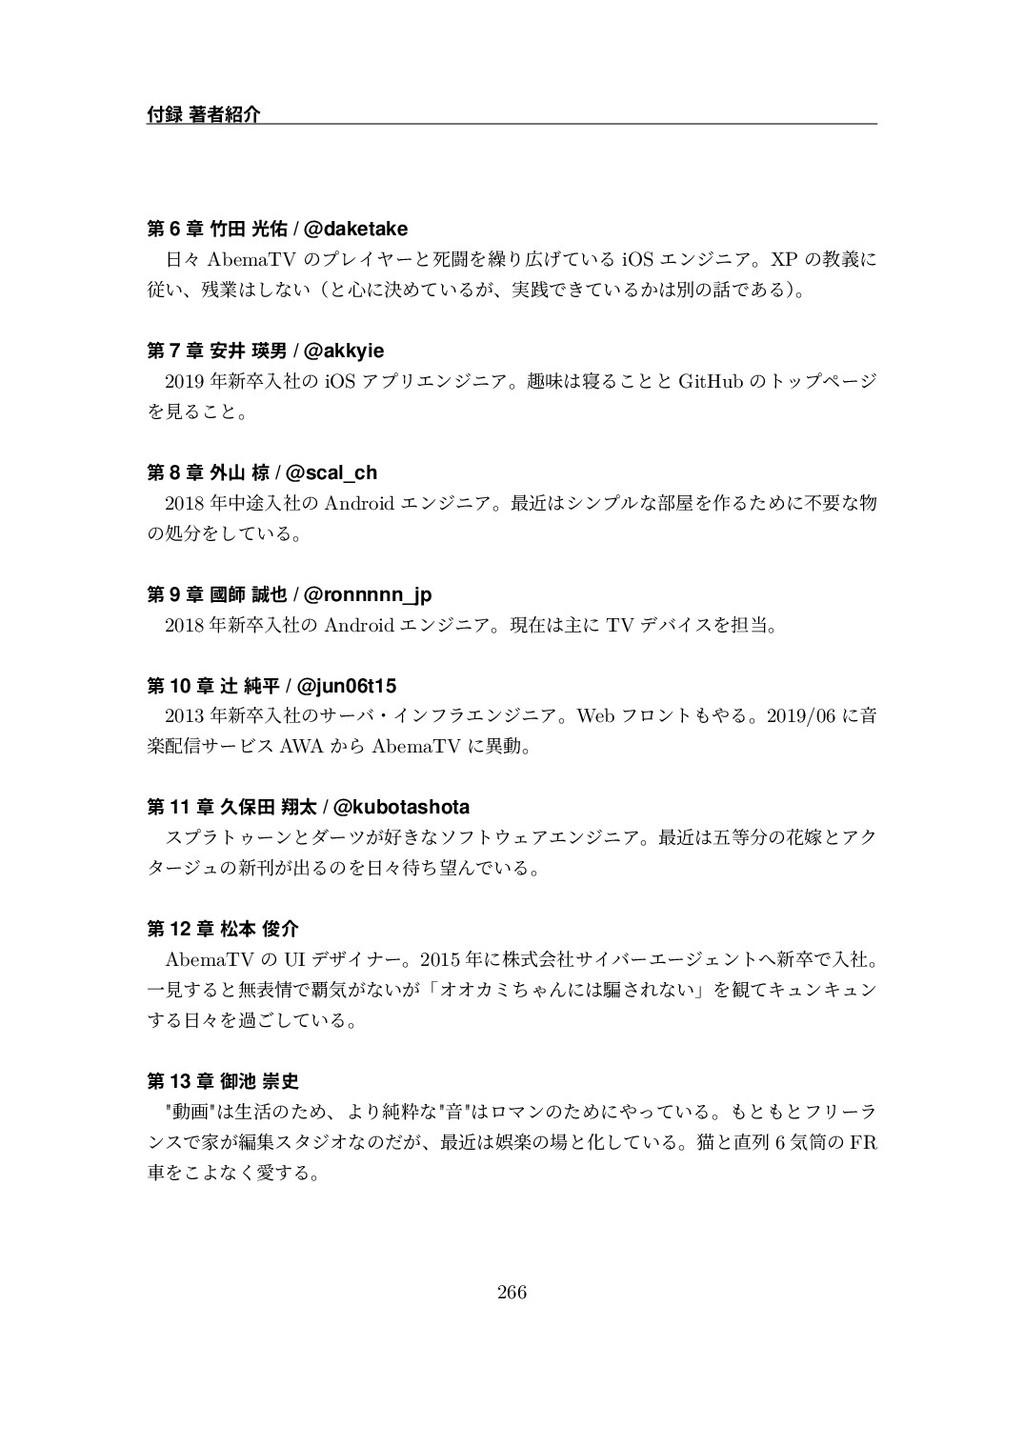 ♀ꎰ 蜷縖磆☭ 瑬 6 珕 琉榹 ⩞⛫ / @daketake 傽չ AbemaTV סوٝؕ...